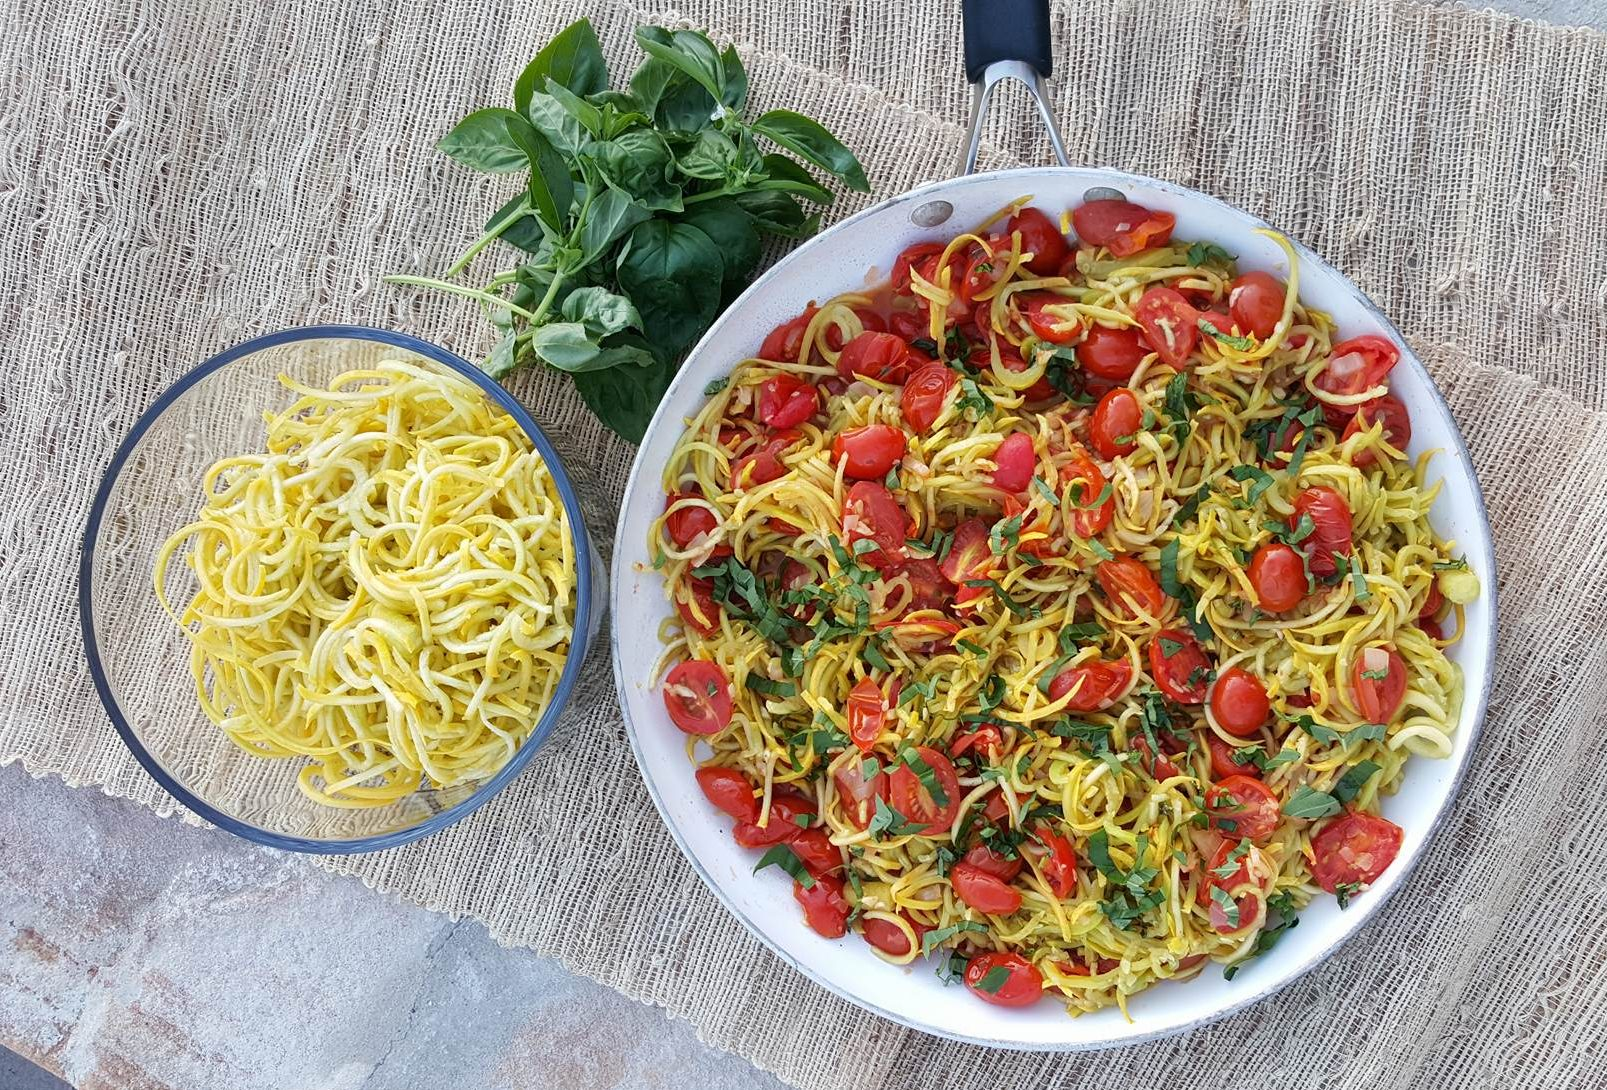 Yellow Summer Squash 'Spaghetti' with Roasted Tomato Sauce ...